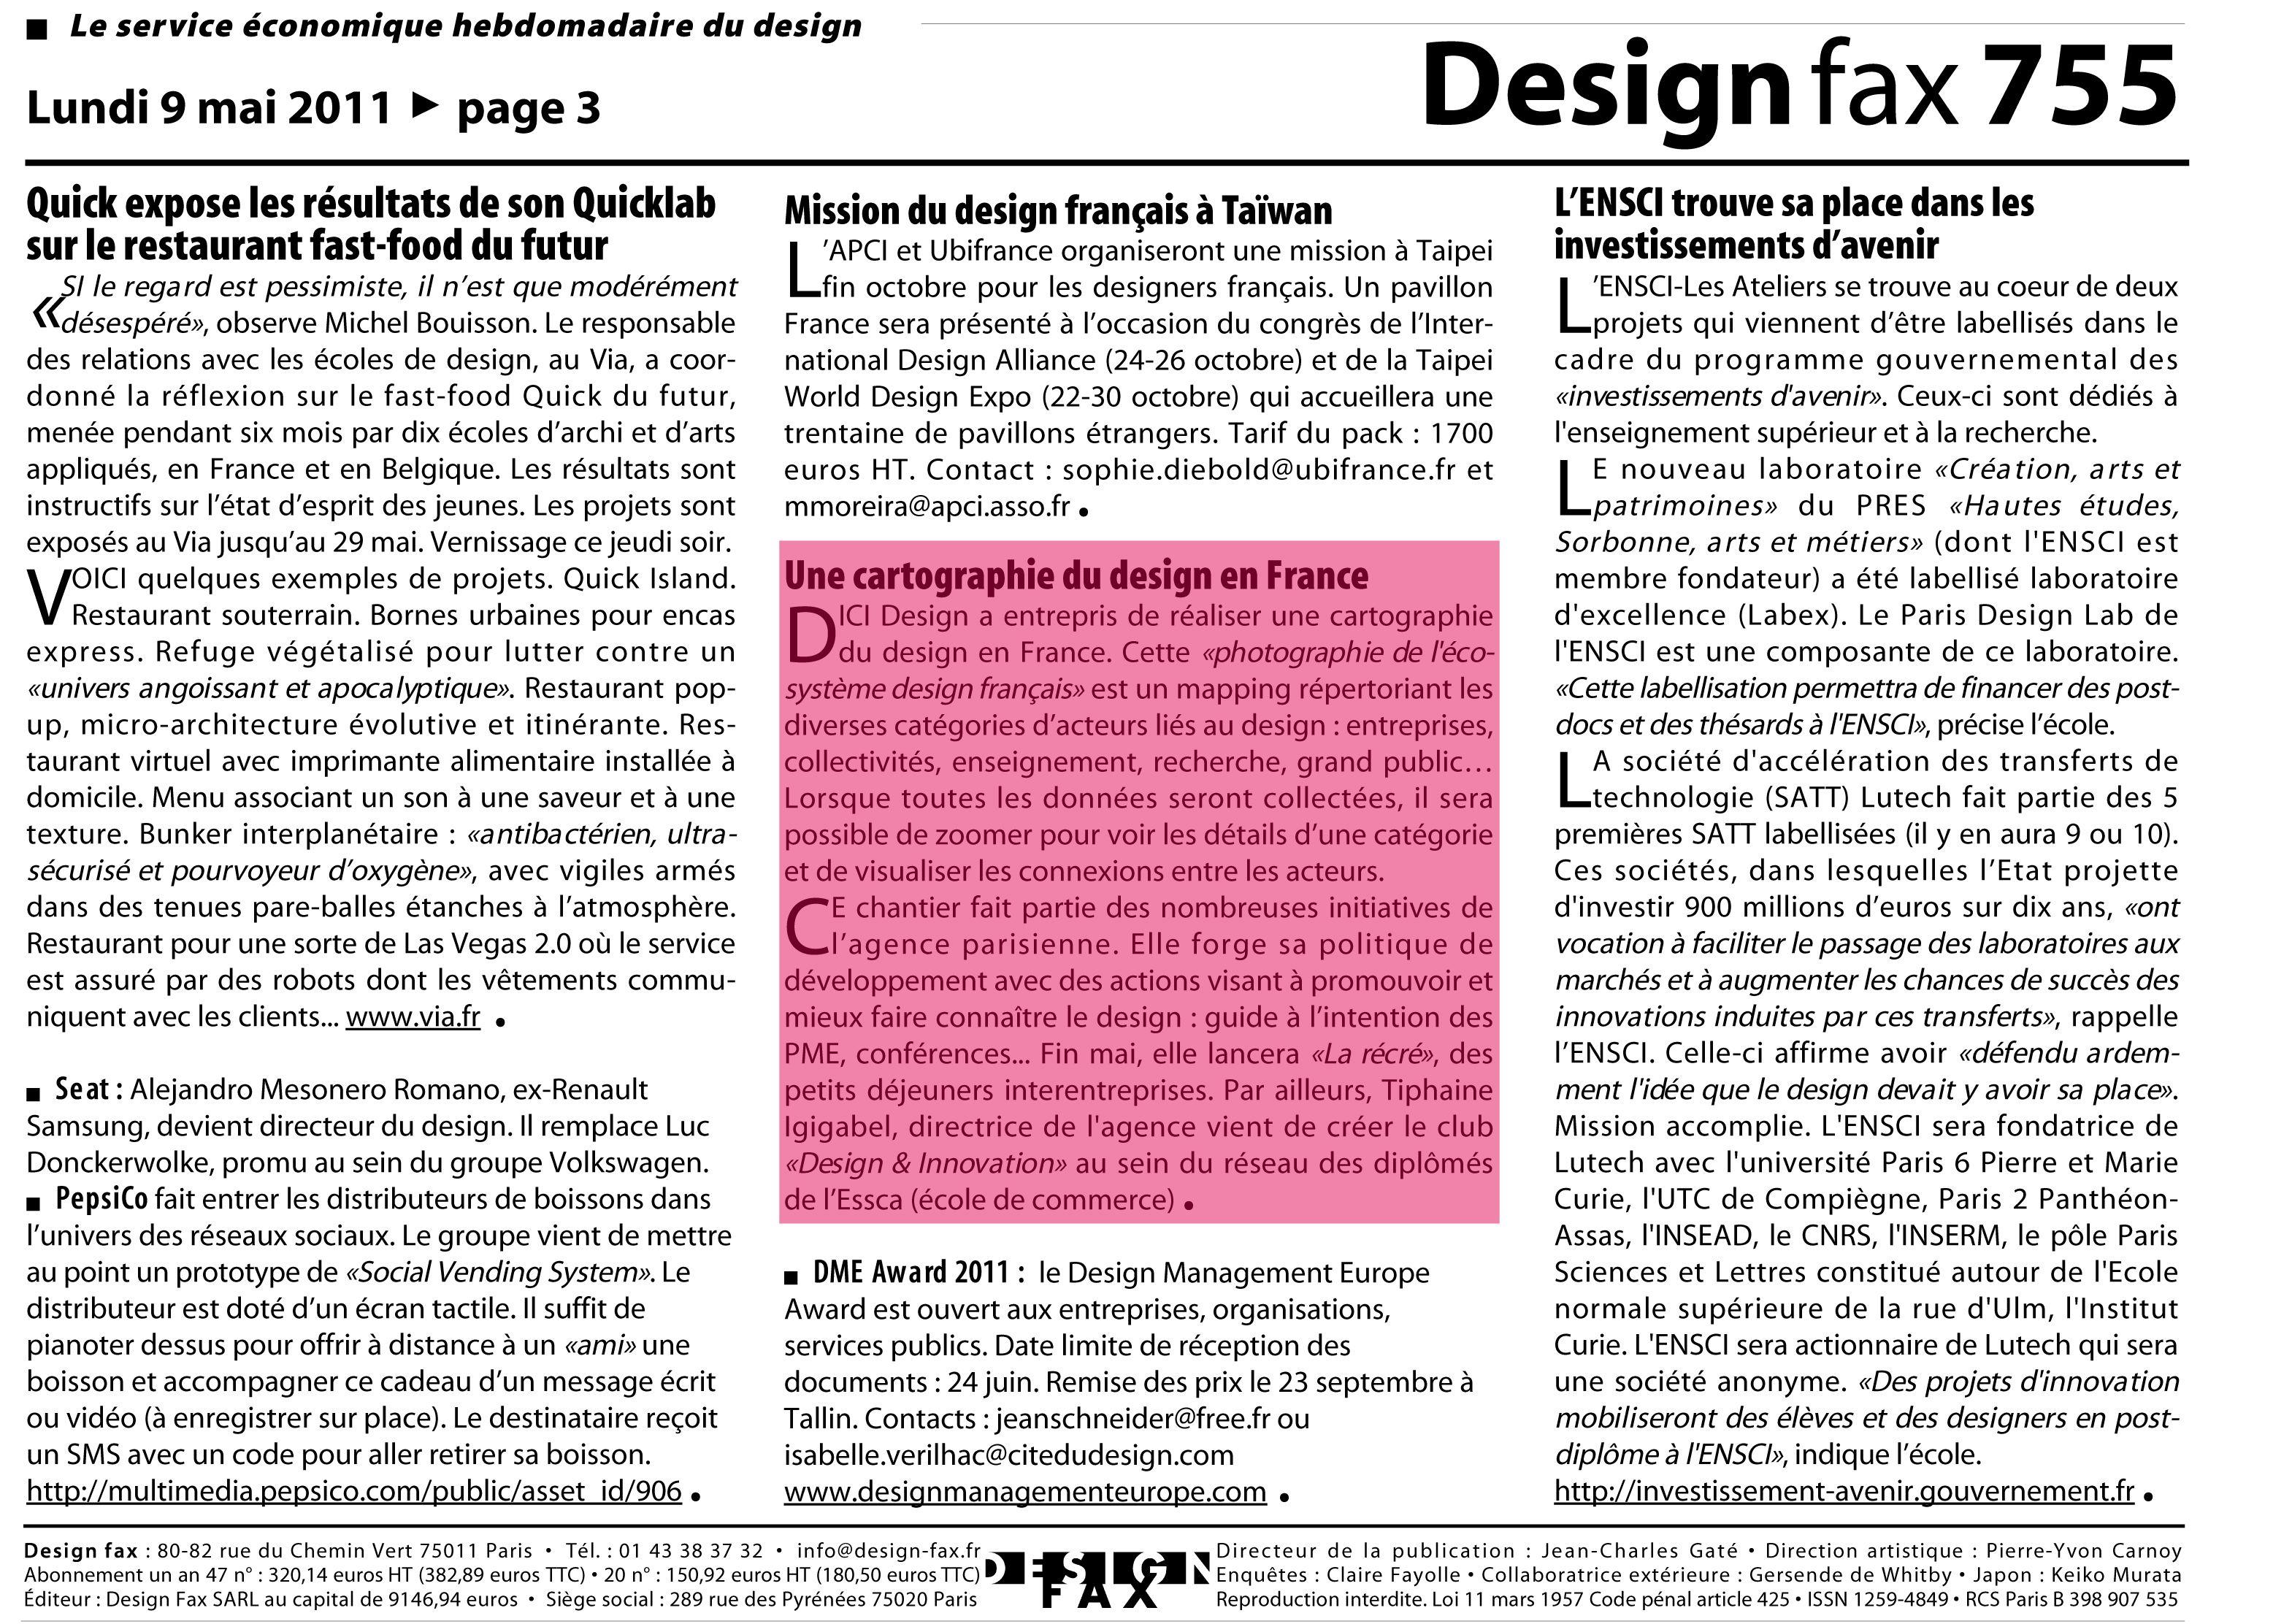 Design Fax 755 Mai 2011 Une Cartographie Du Design En France Par Dici Design Restaurant Fast Food Cartographie Taipei